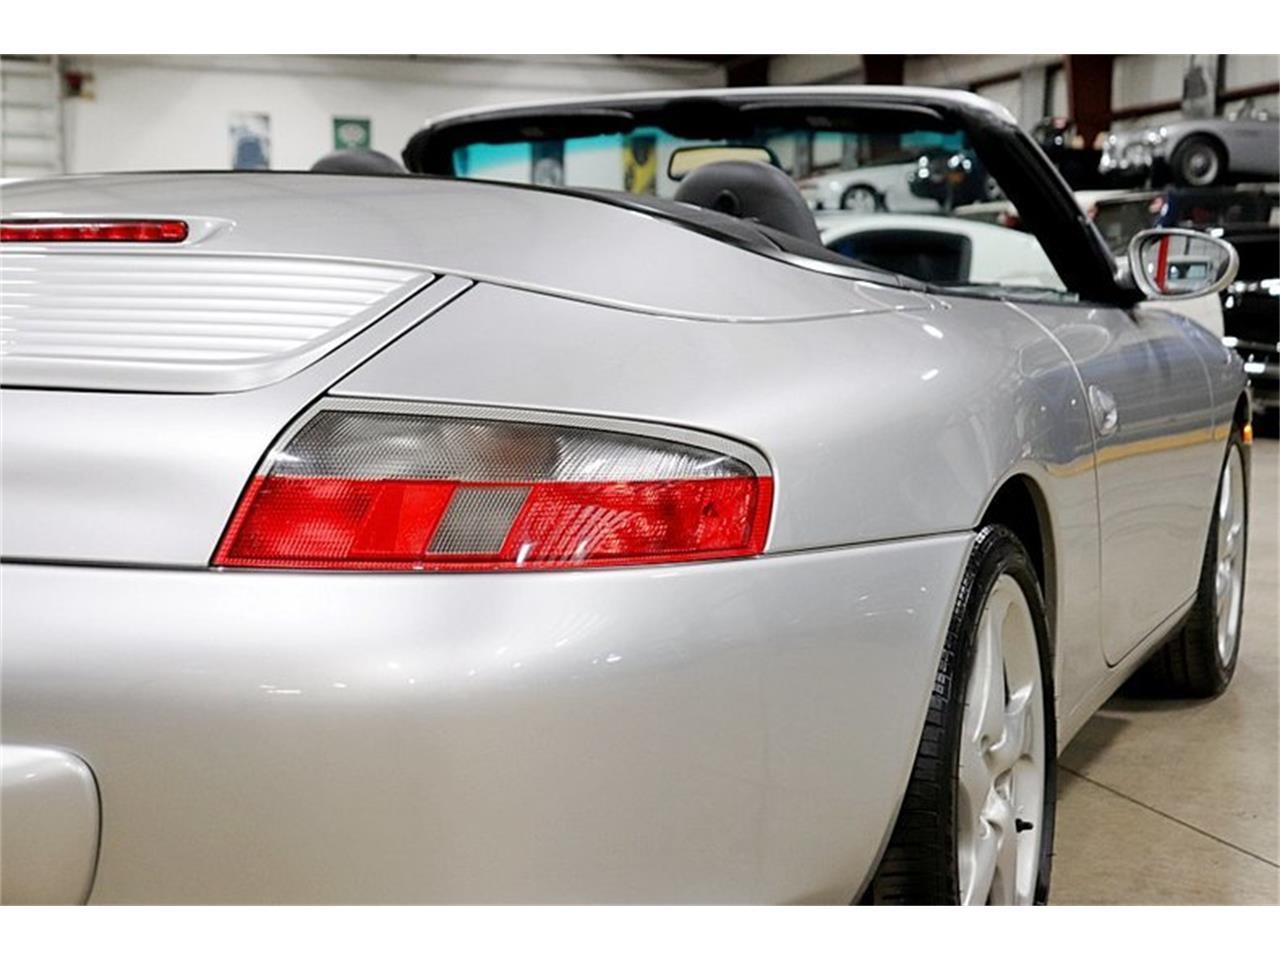 Large Picture of '04 Porsche 911 located in Michigan - $36,900.00 - Q409